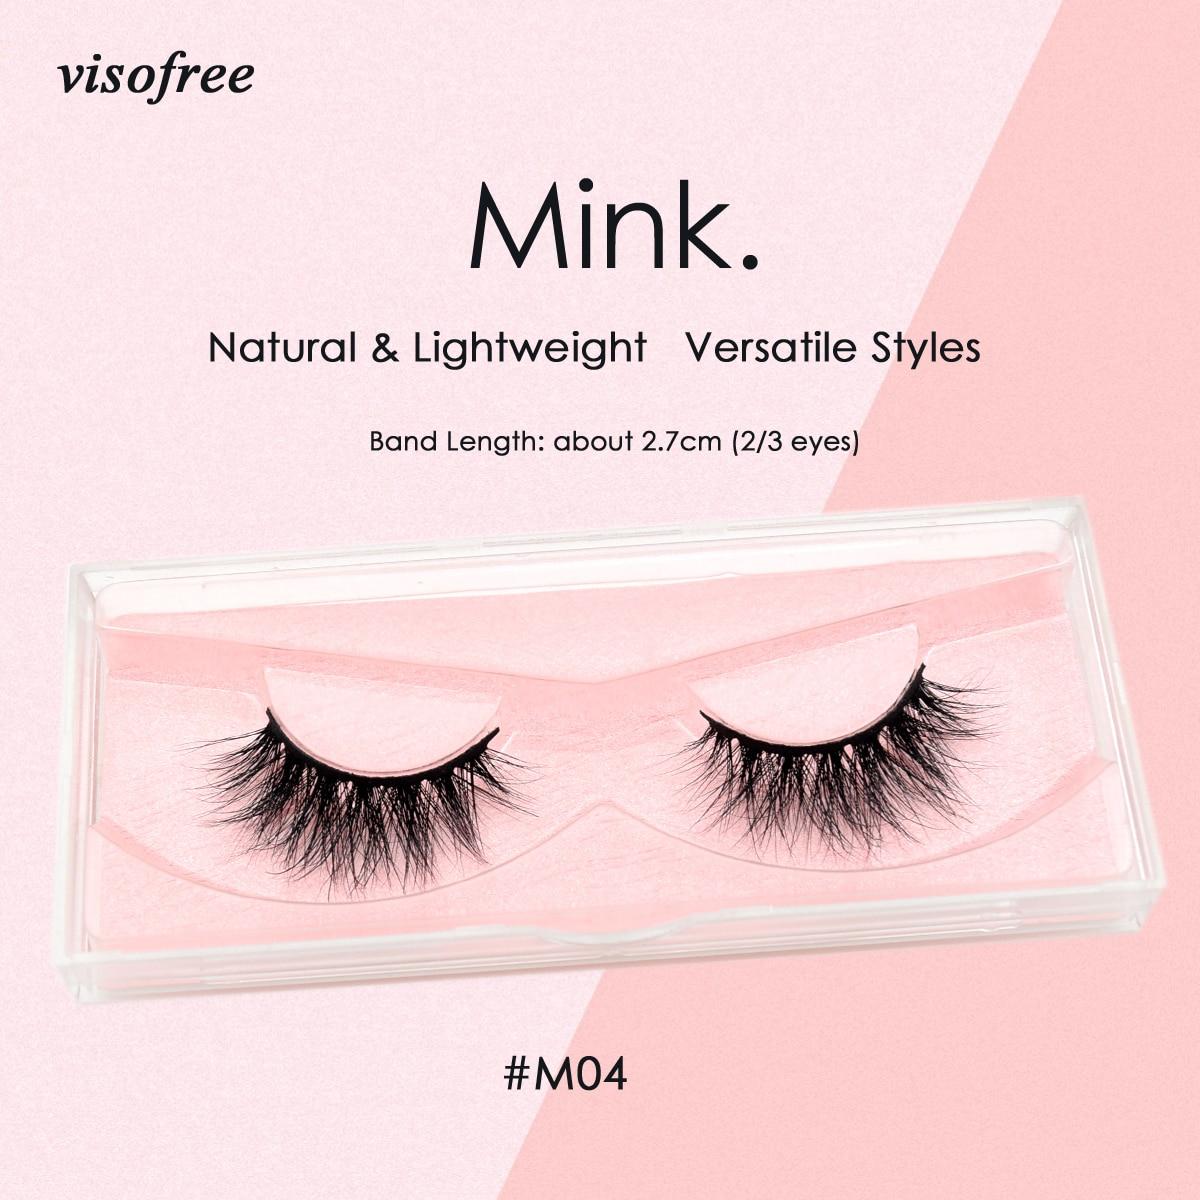 Visofree Lashes 3D Mink Lashes Cruelty free Mink False Eyelashes Thick Long Handmade Mink Eyelashes For Makeup faux cils M04